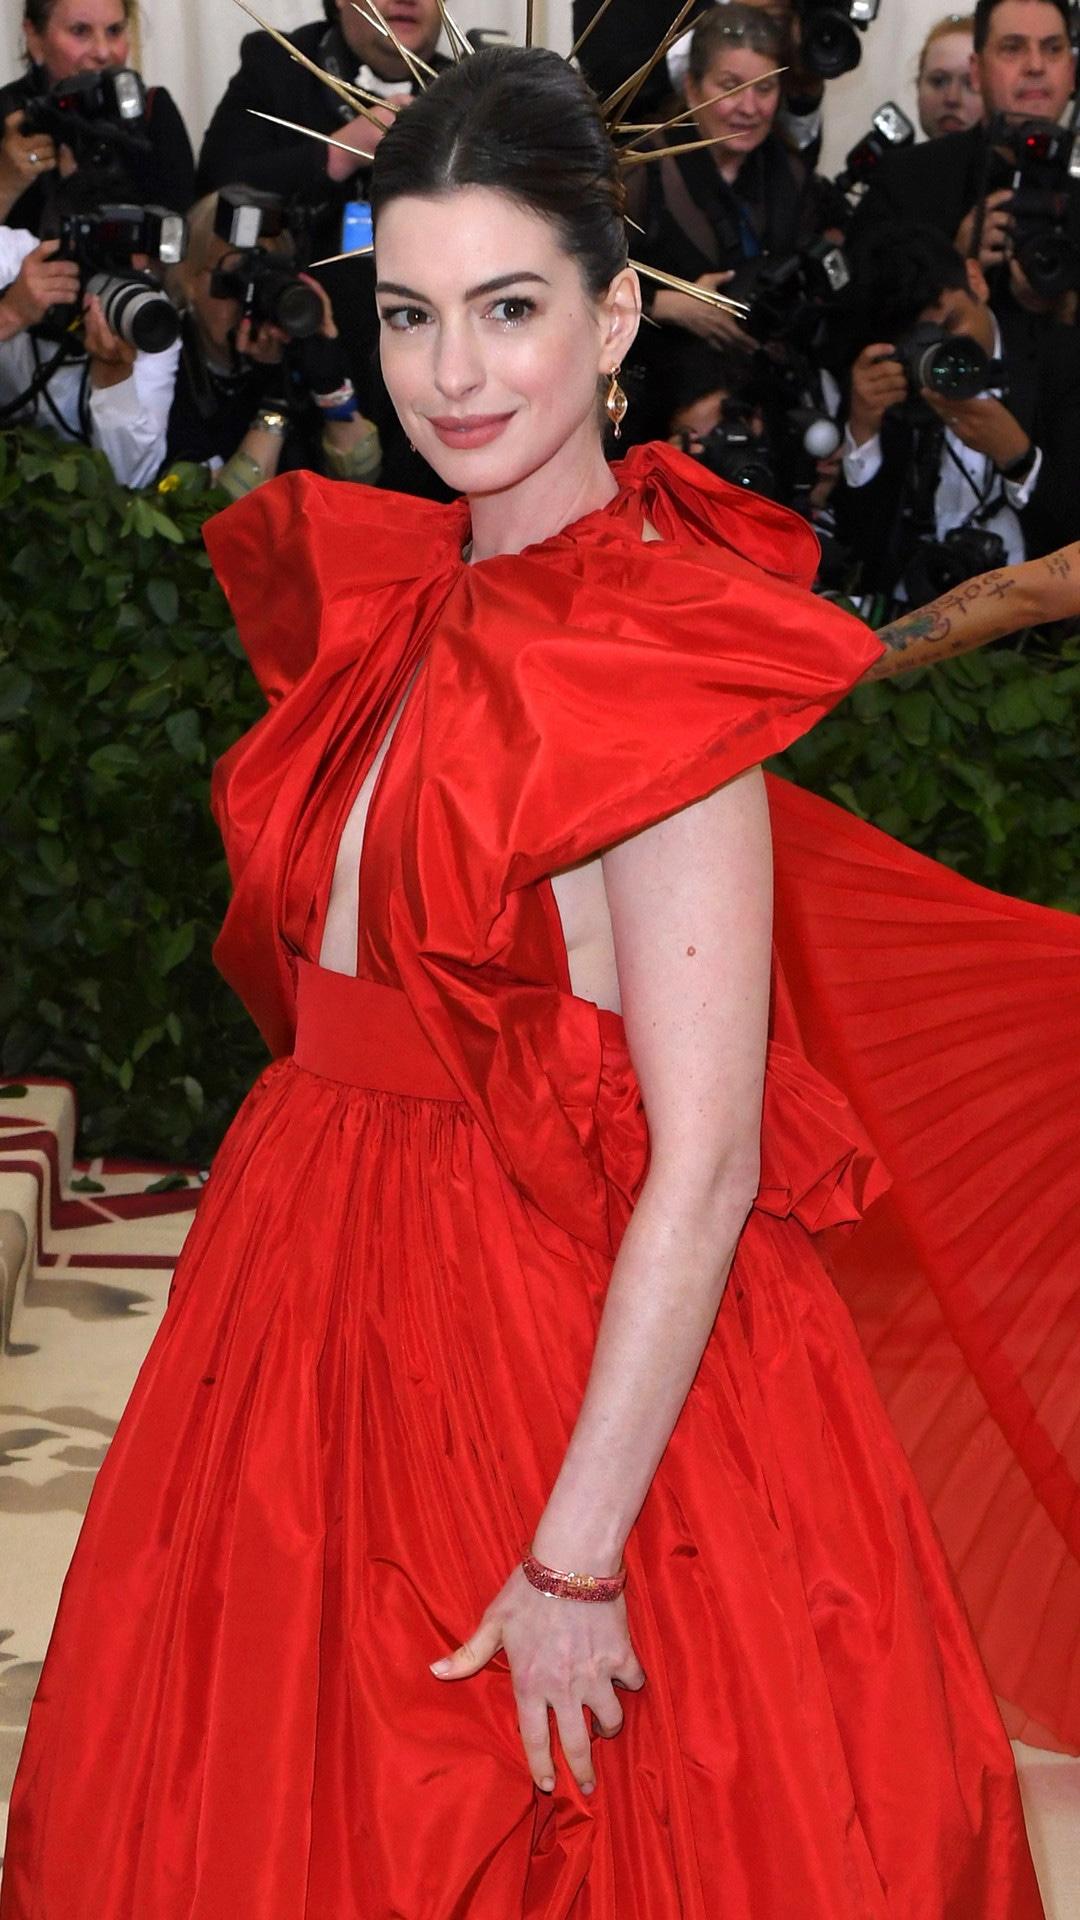 Anne Hathaway, 2018 Met Gala, Red Carpet Fashions